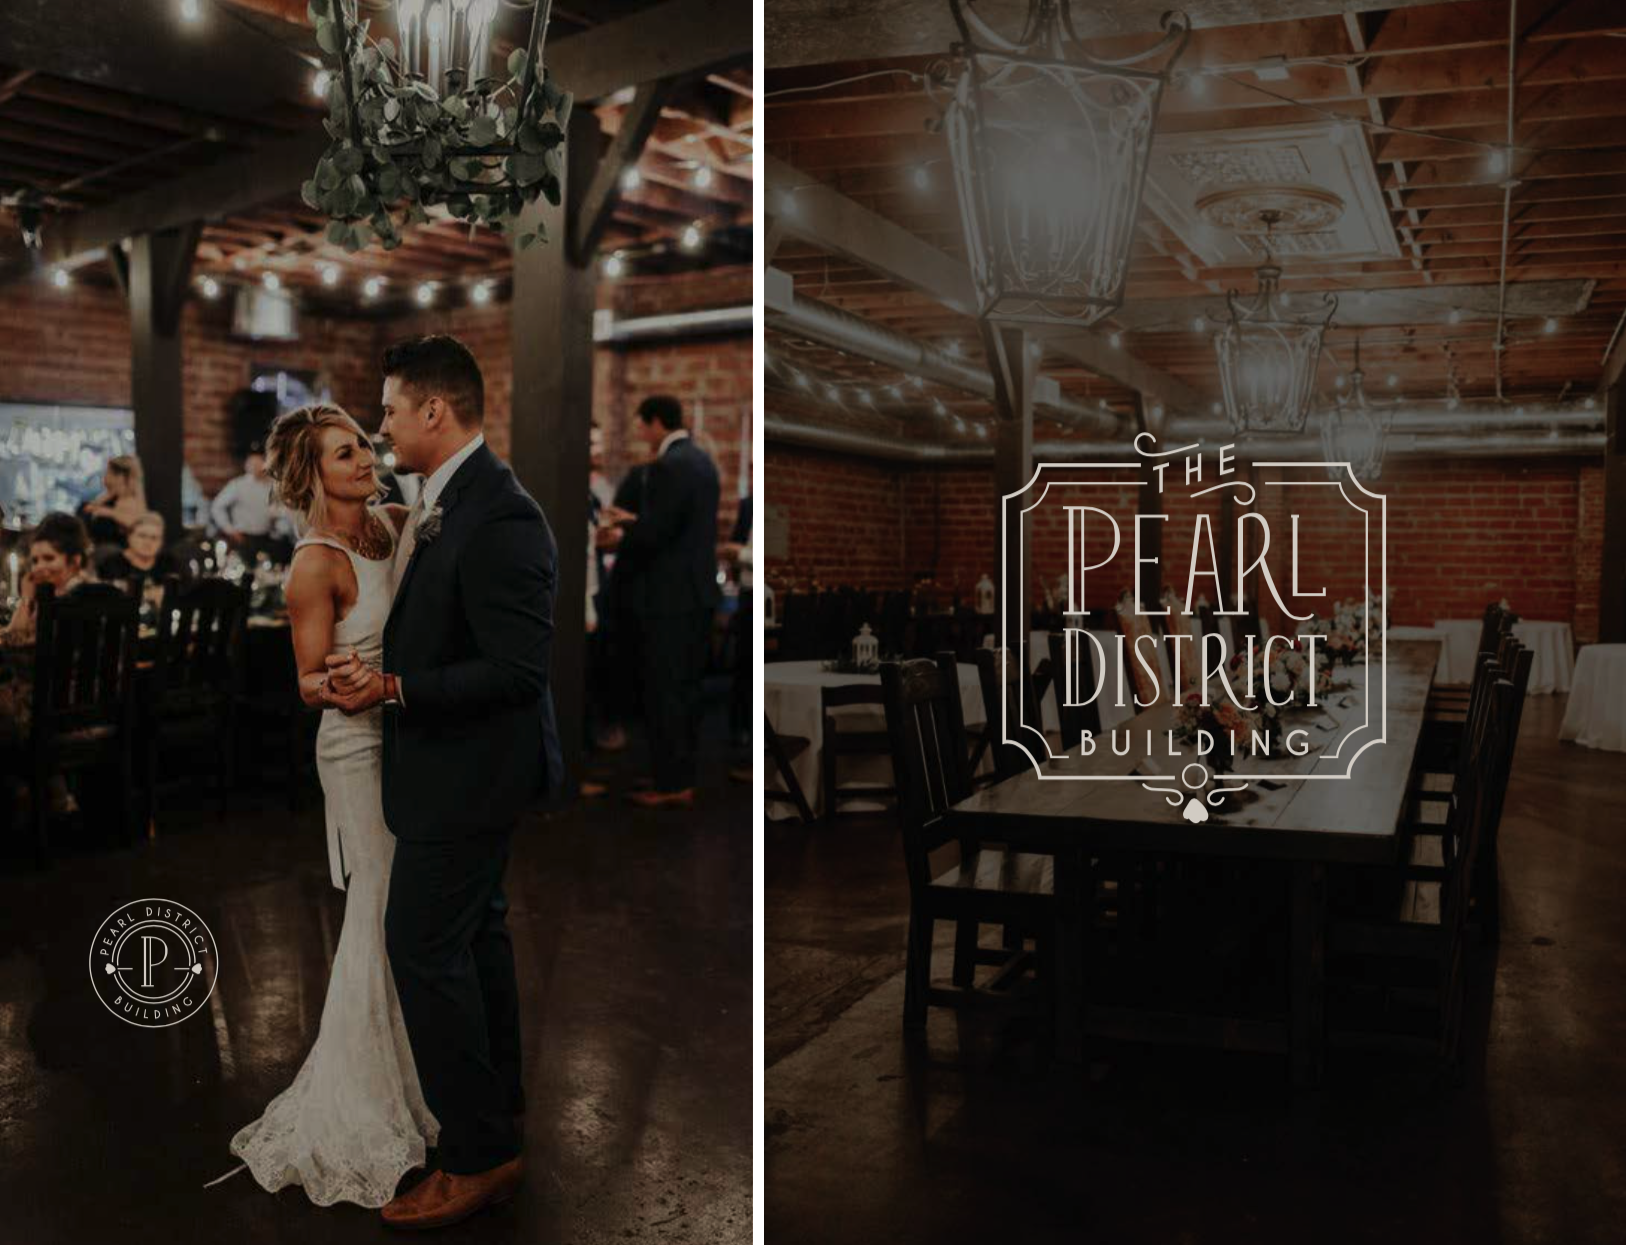 Pearl District Building-Tulsa-WeddingVenue-Branding